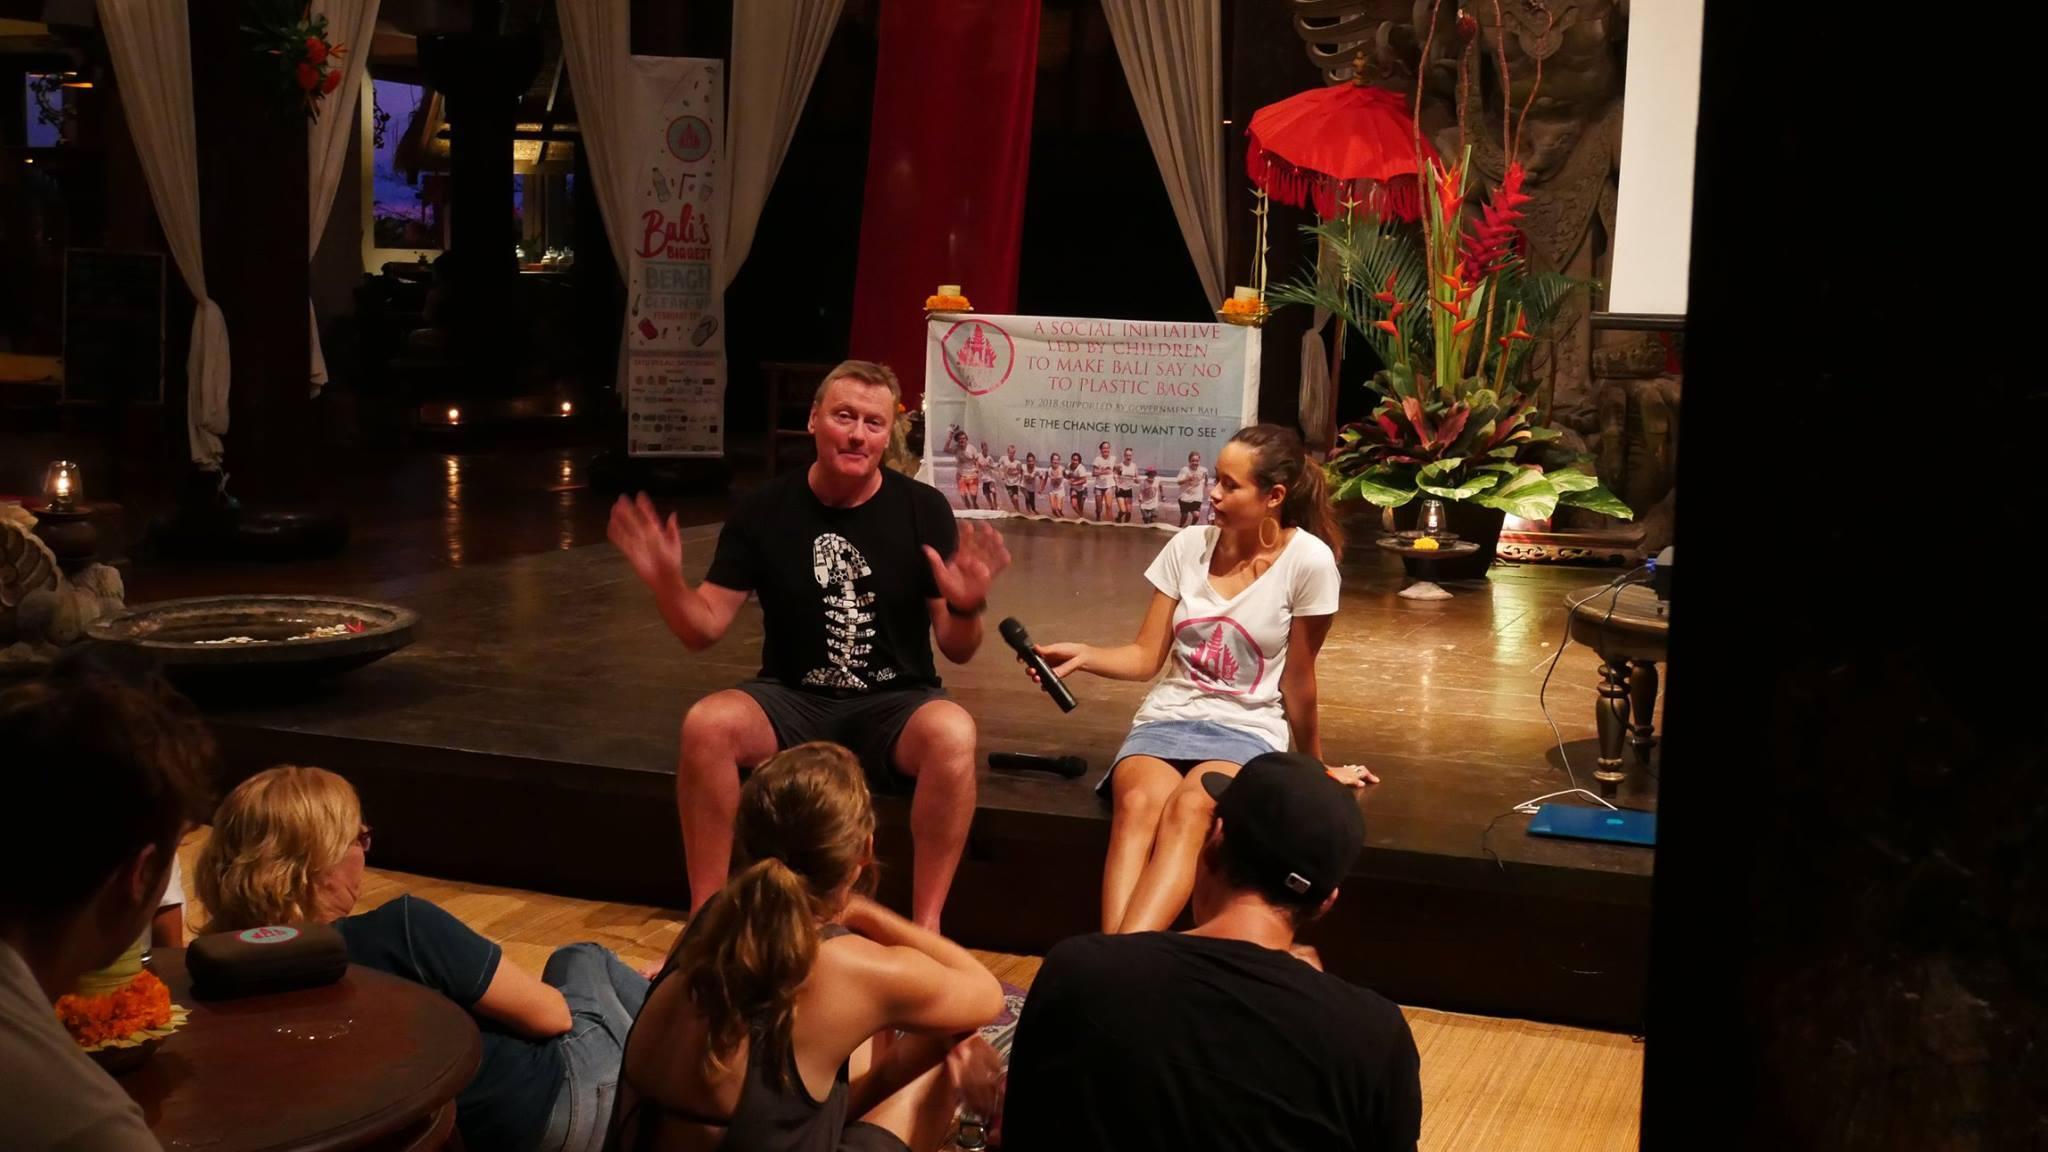 David Jones speaking in Bali